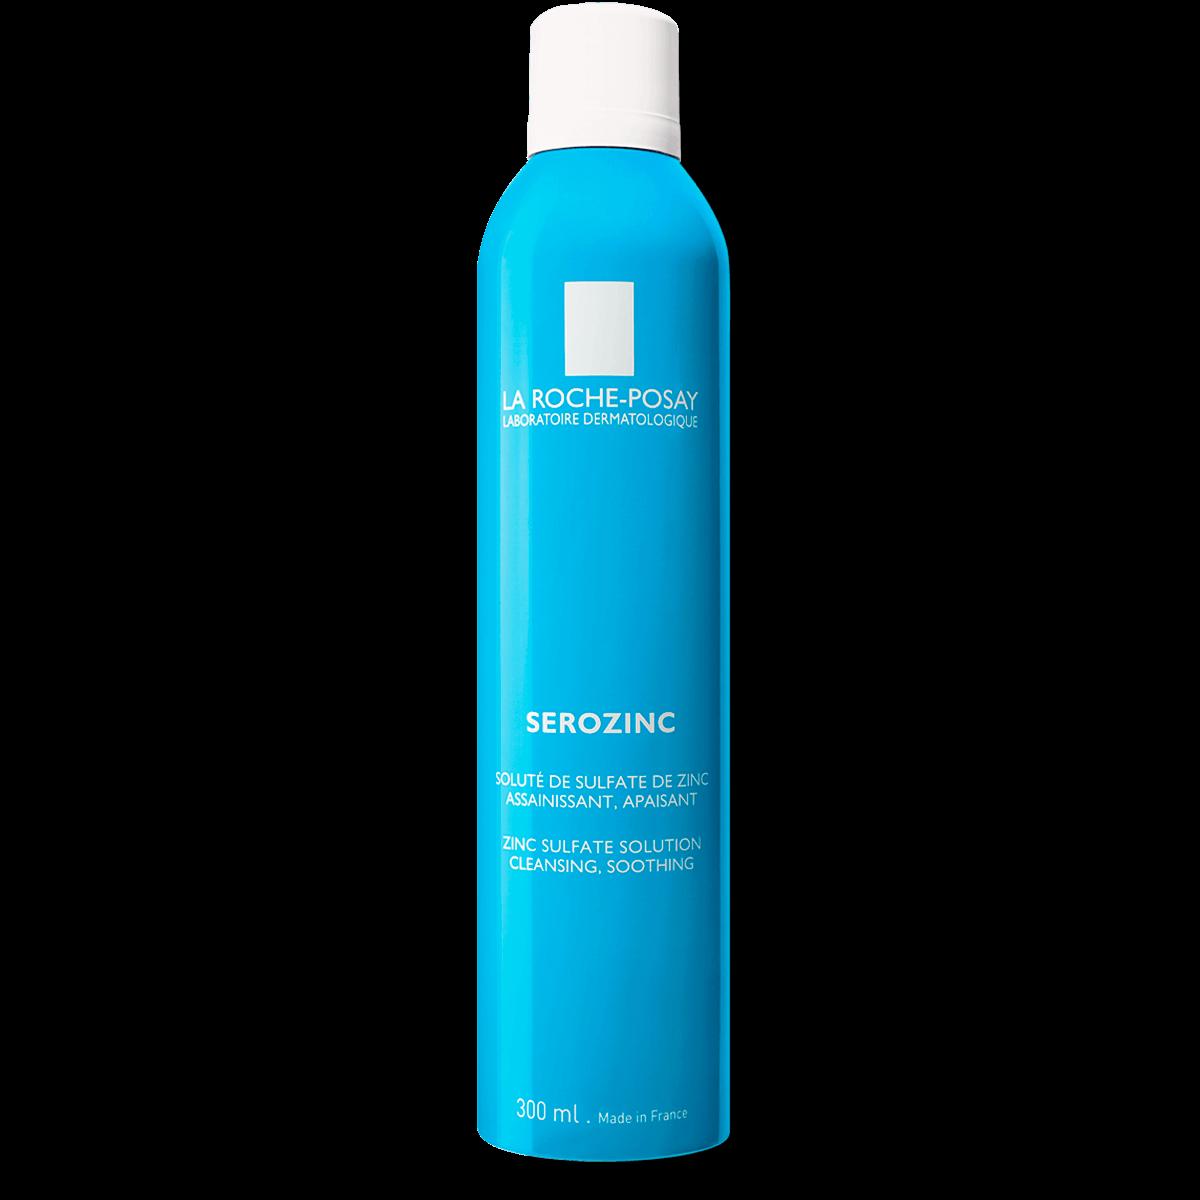 La Roche Posay ProductPage Serozinc Spray Zinc 300ml 3337875565783 Fro